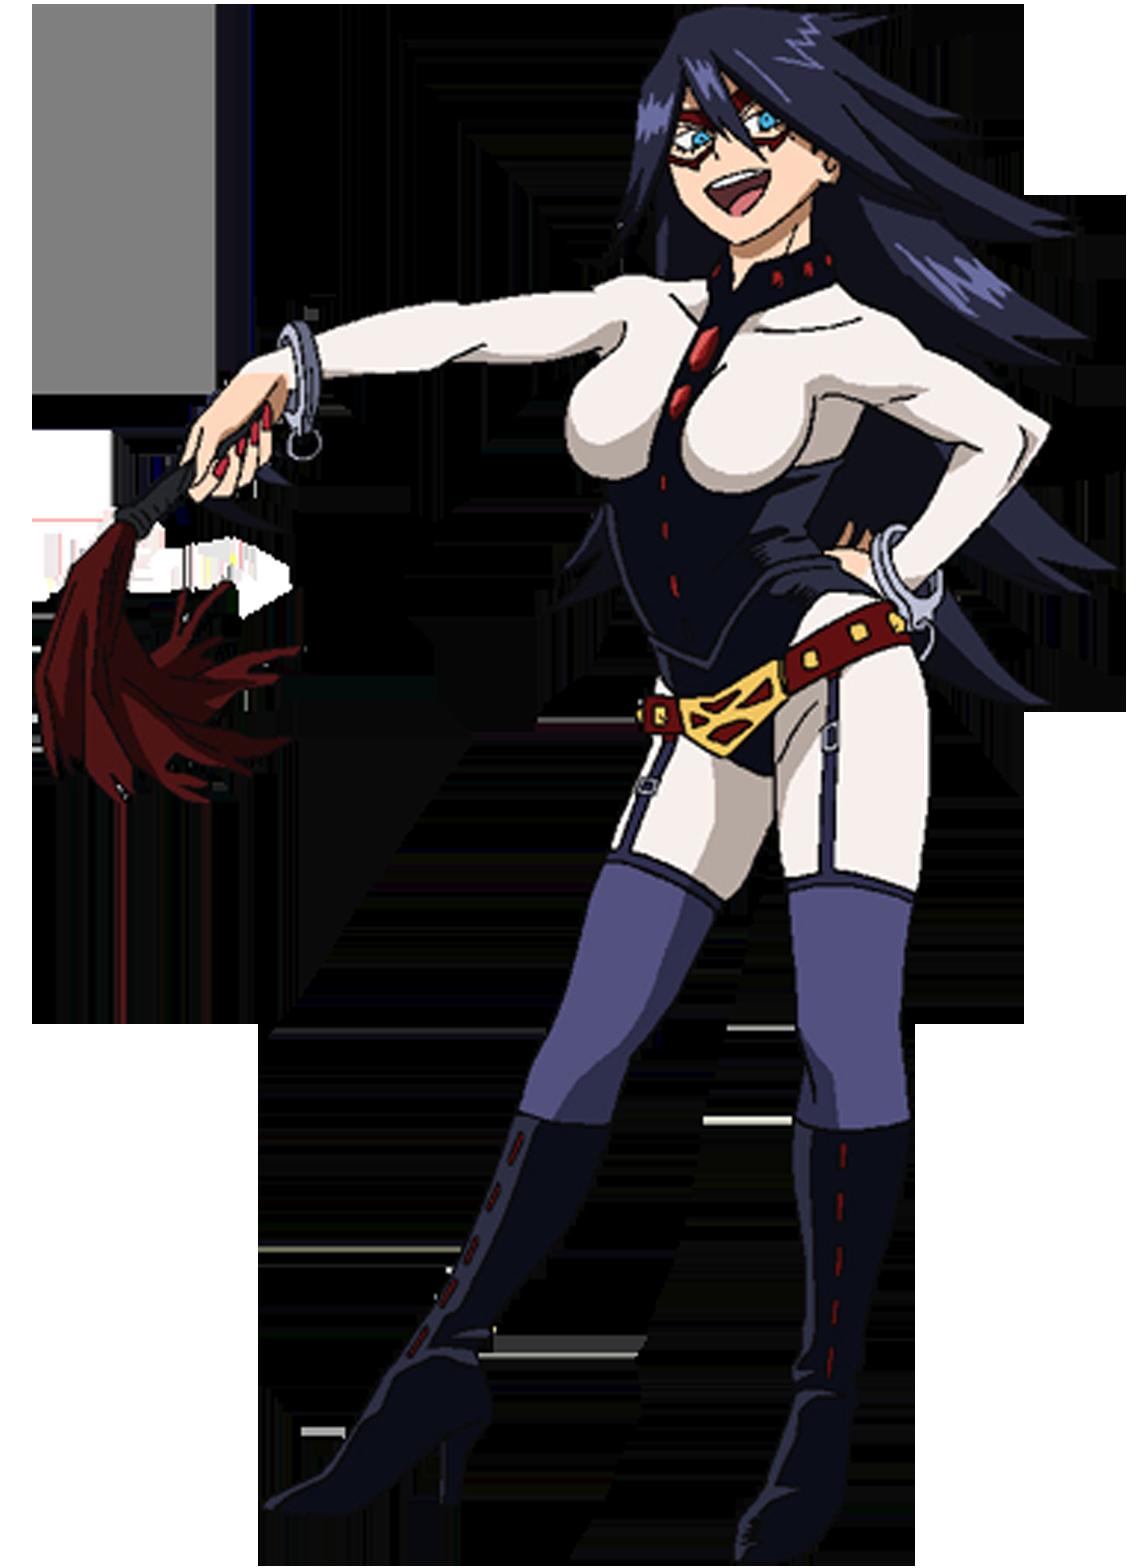 Midnight Anime Hero academia characters, My hero